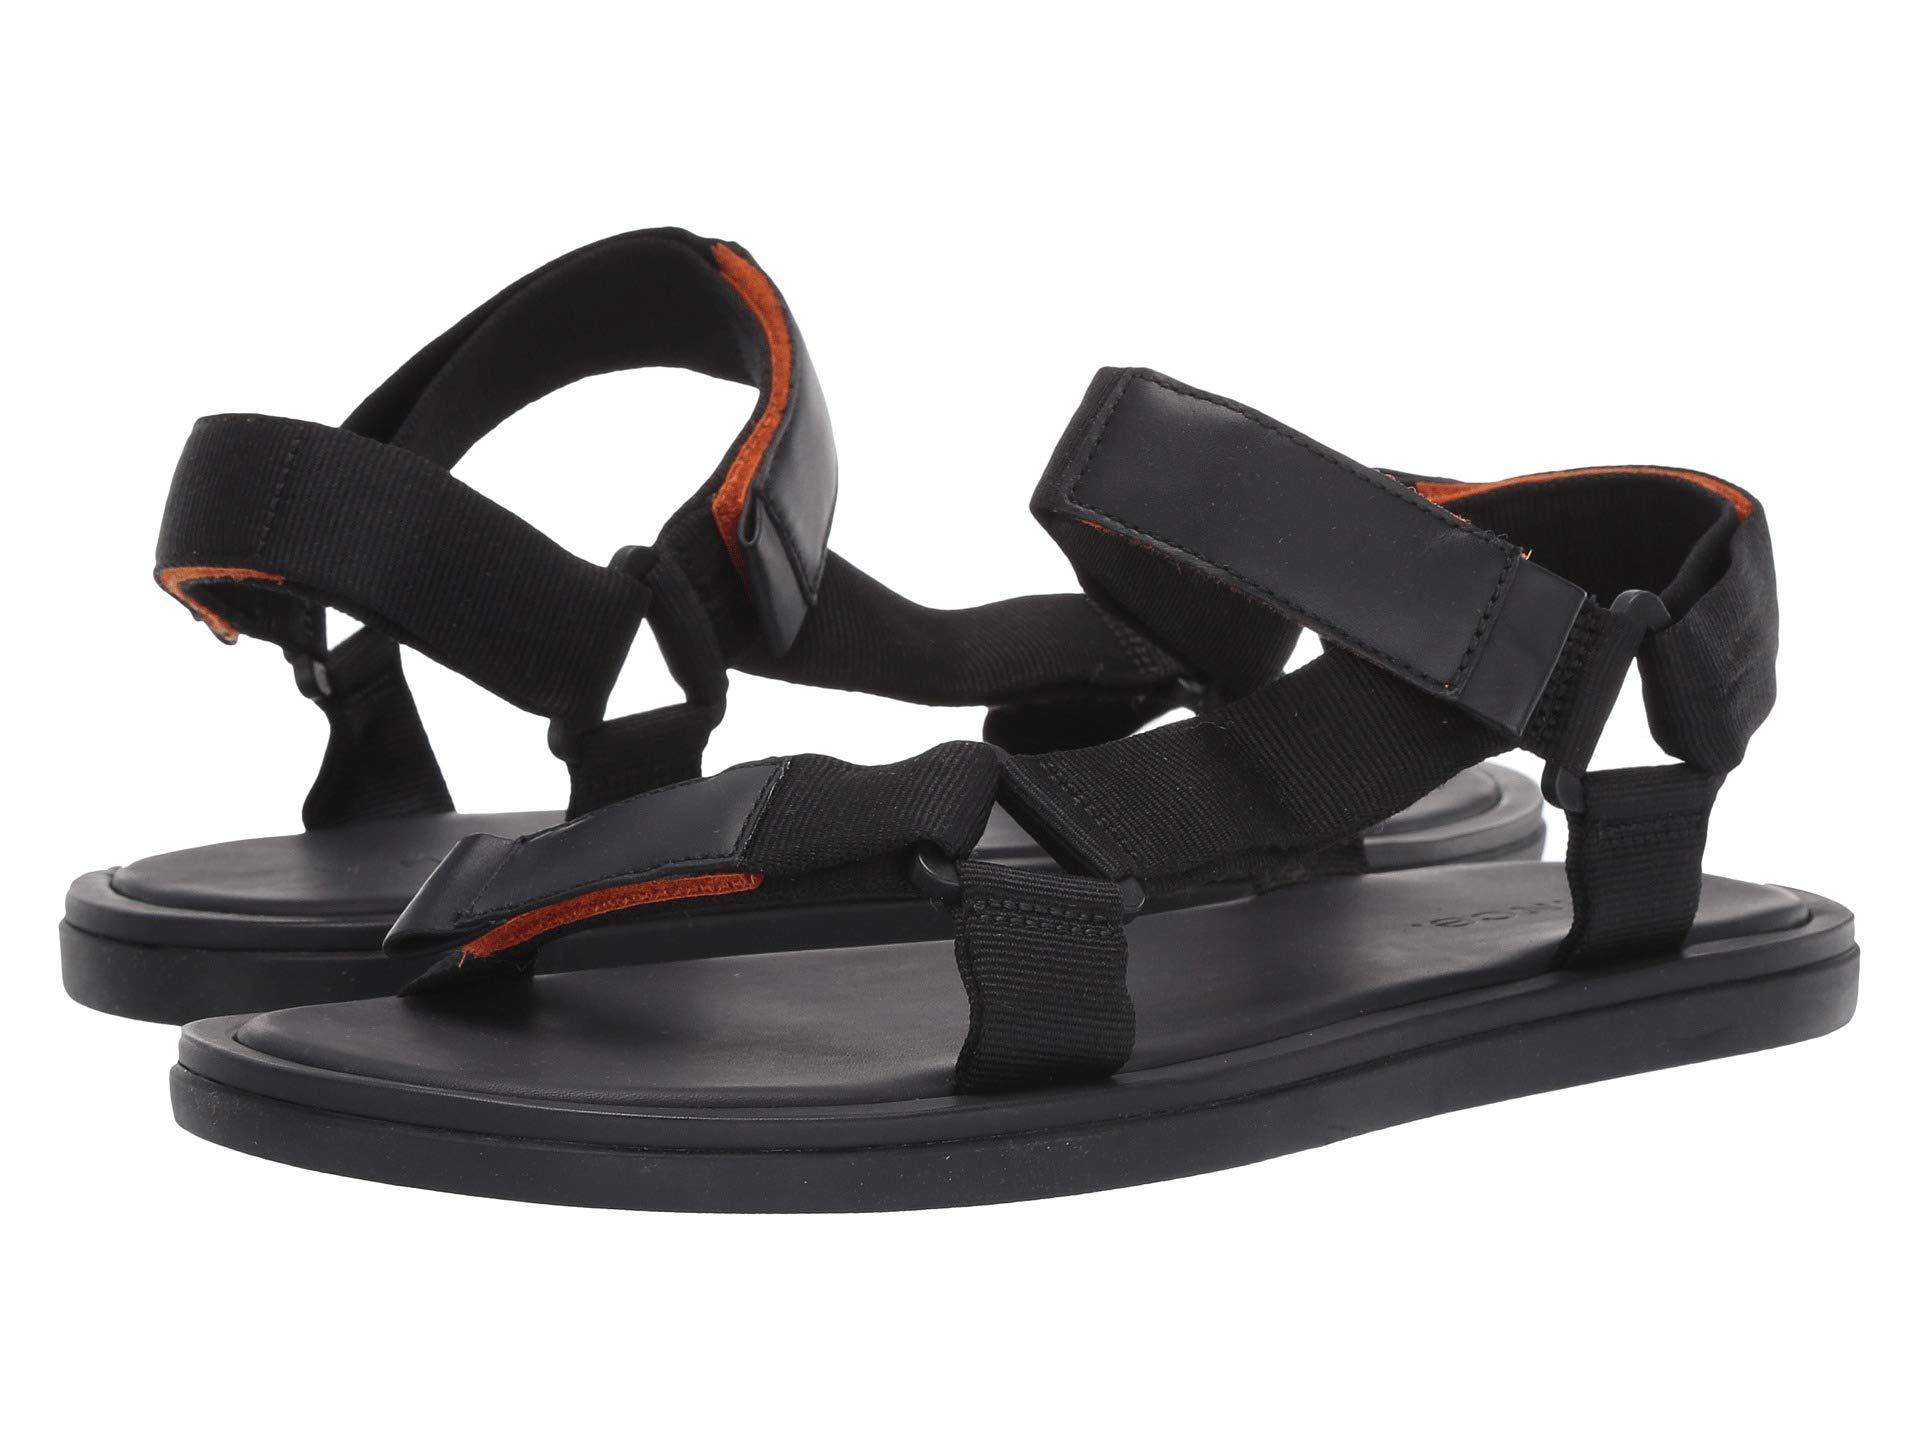 44b4d8842 Lyst - Vince Men s Destin Velcro Strap Walking Sandals in Black for Men